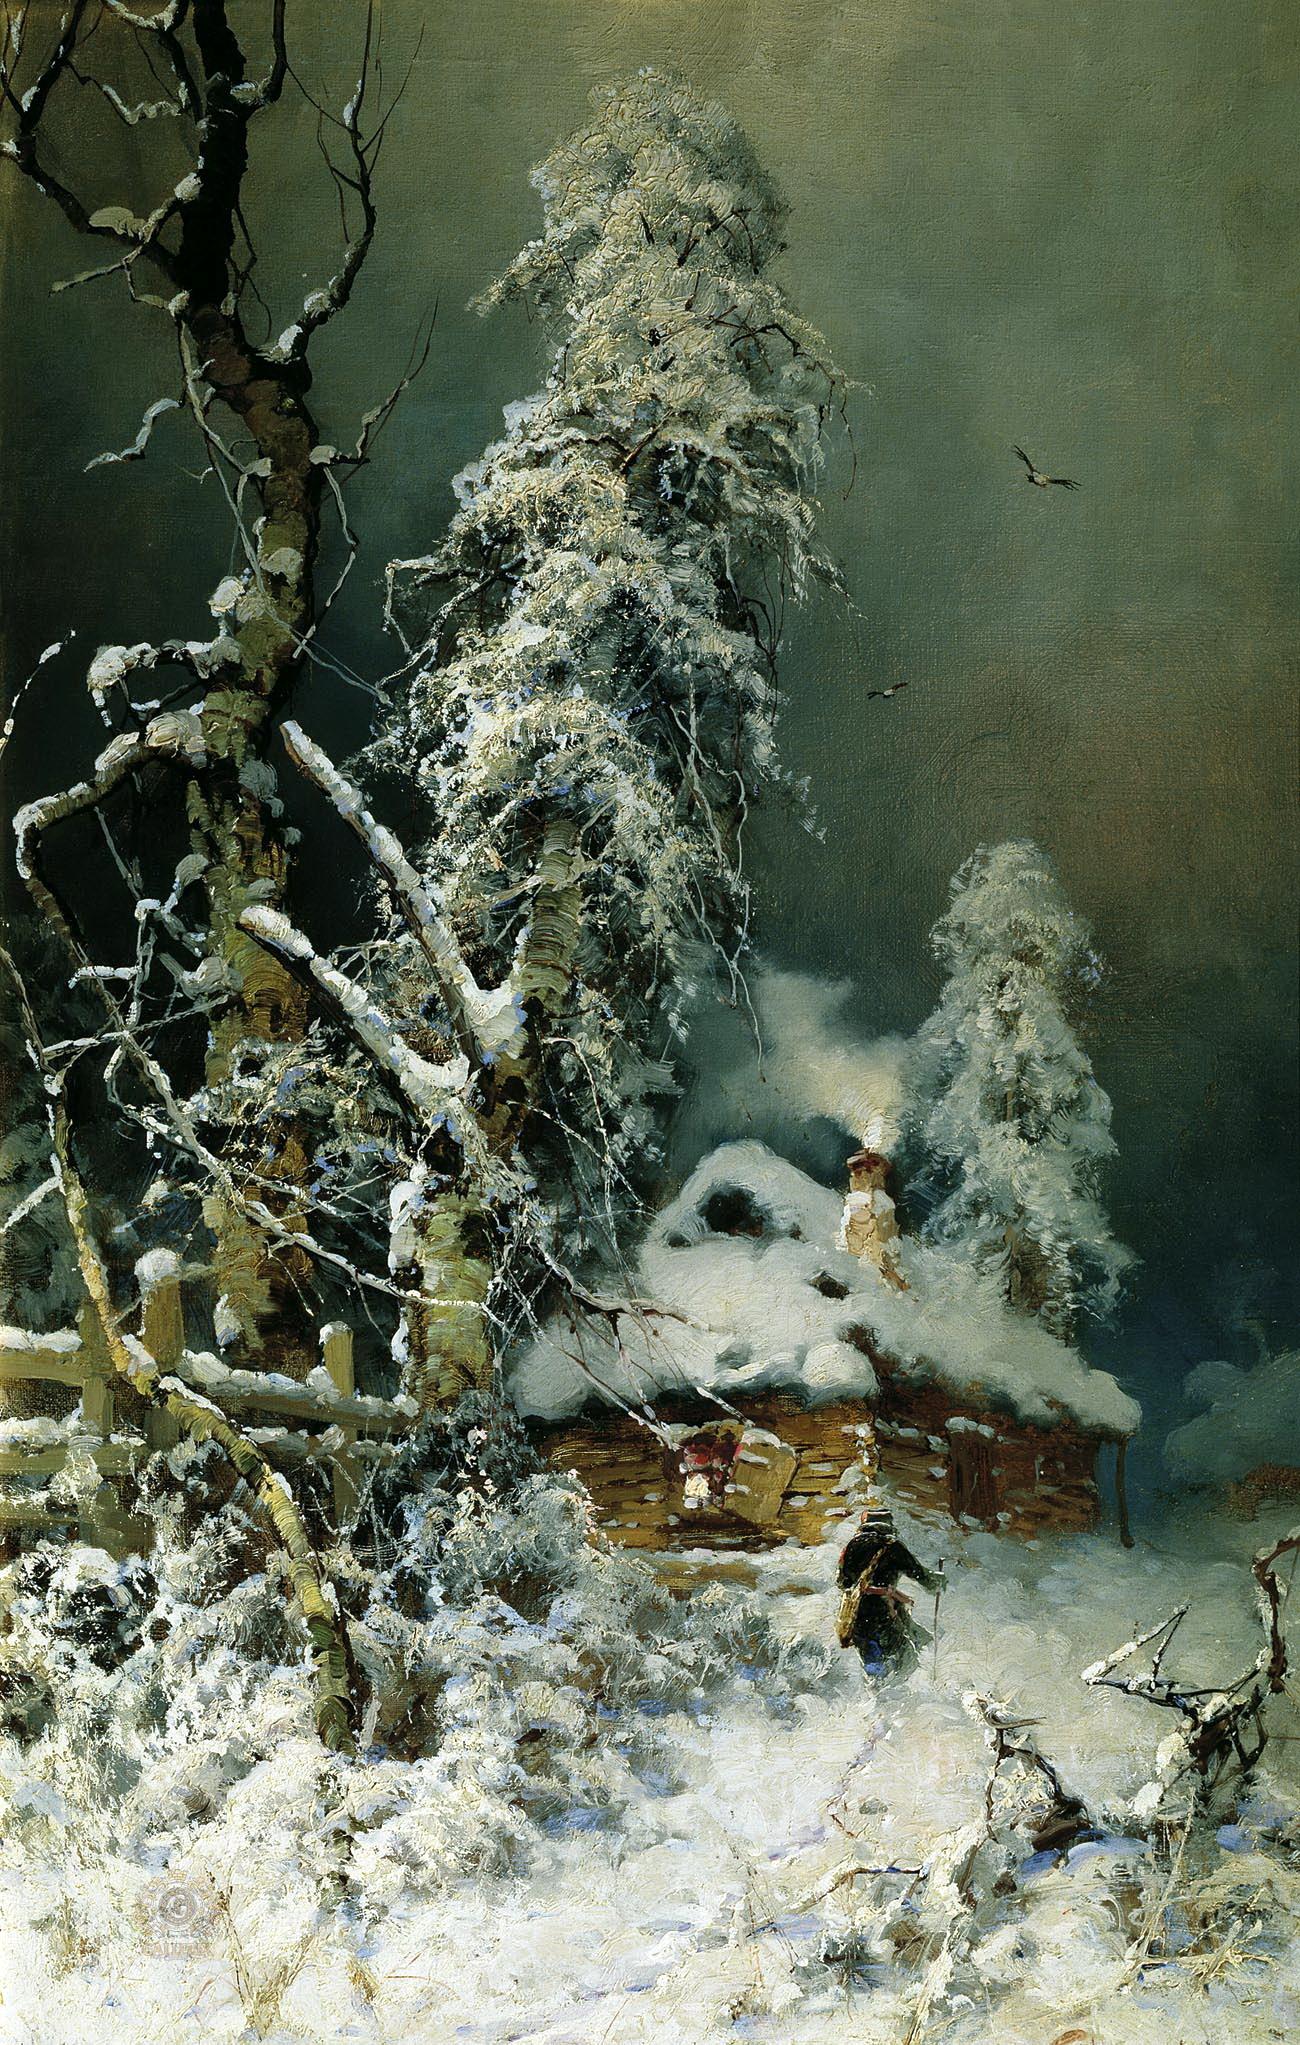 КЛЕВЕР Юлий - Зимний пейзаж с избушкой.jpg